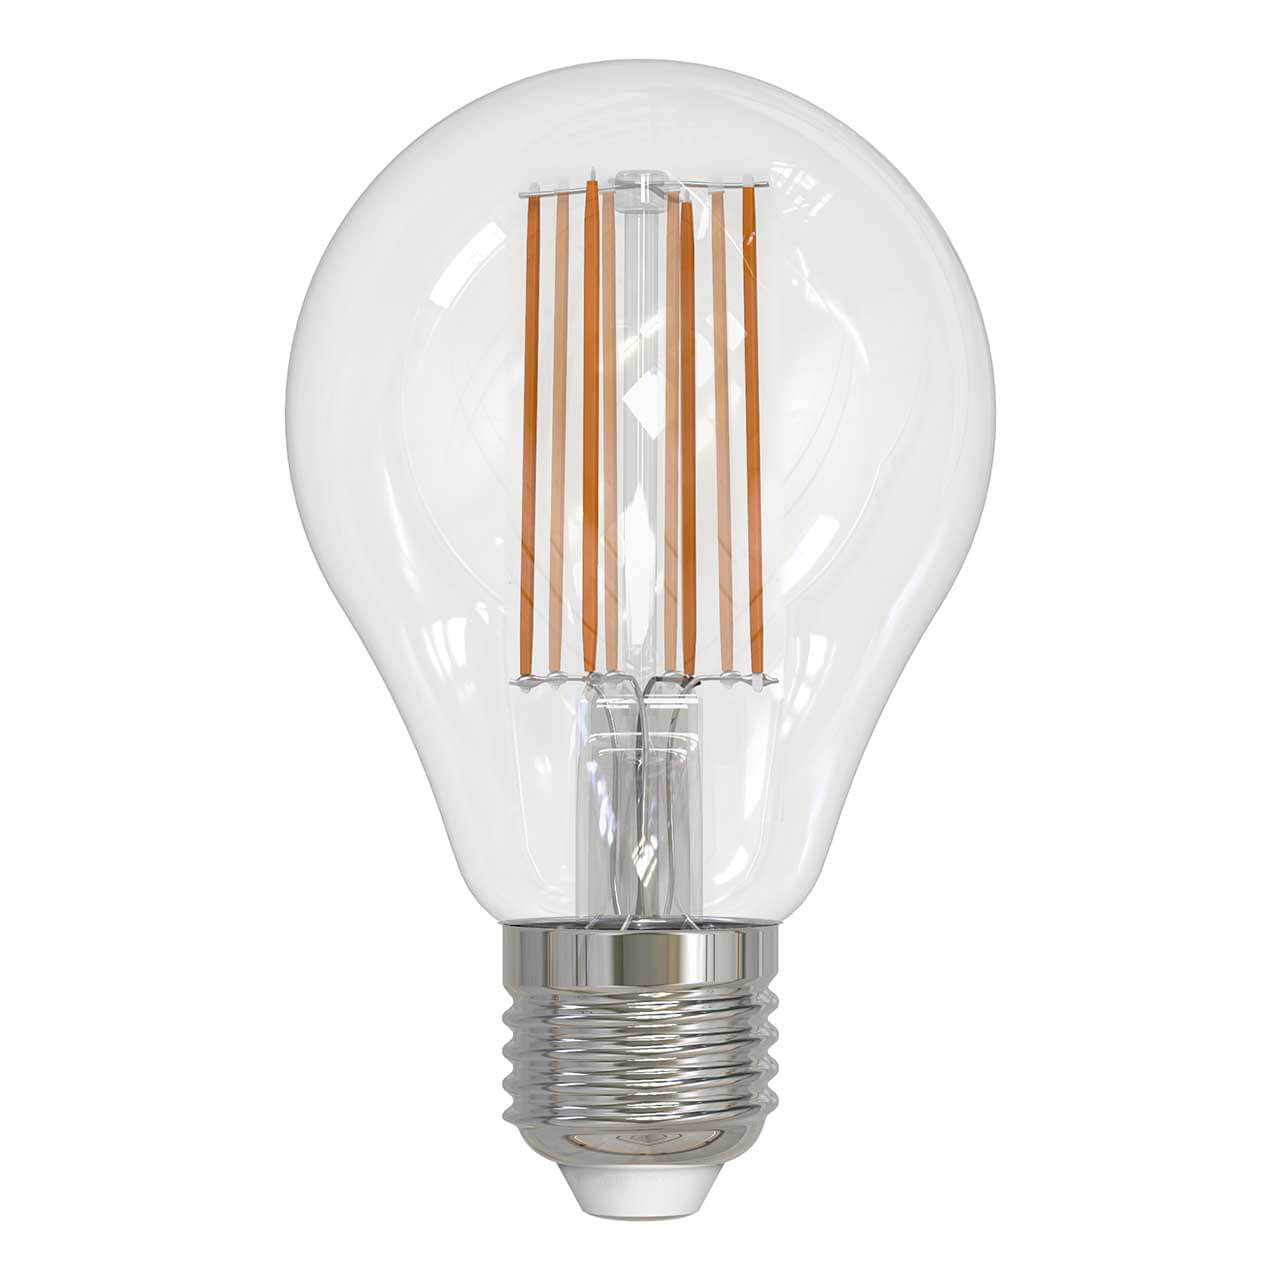 Фото - Лампочка Uniel LED-A70-17W/3000K/E27/CL PLS02WH LED-A60 лампочка uniel led a60 10w ww e27 cl pls02wh sky